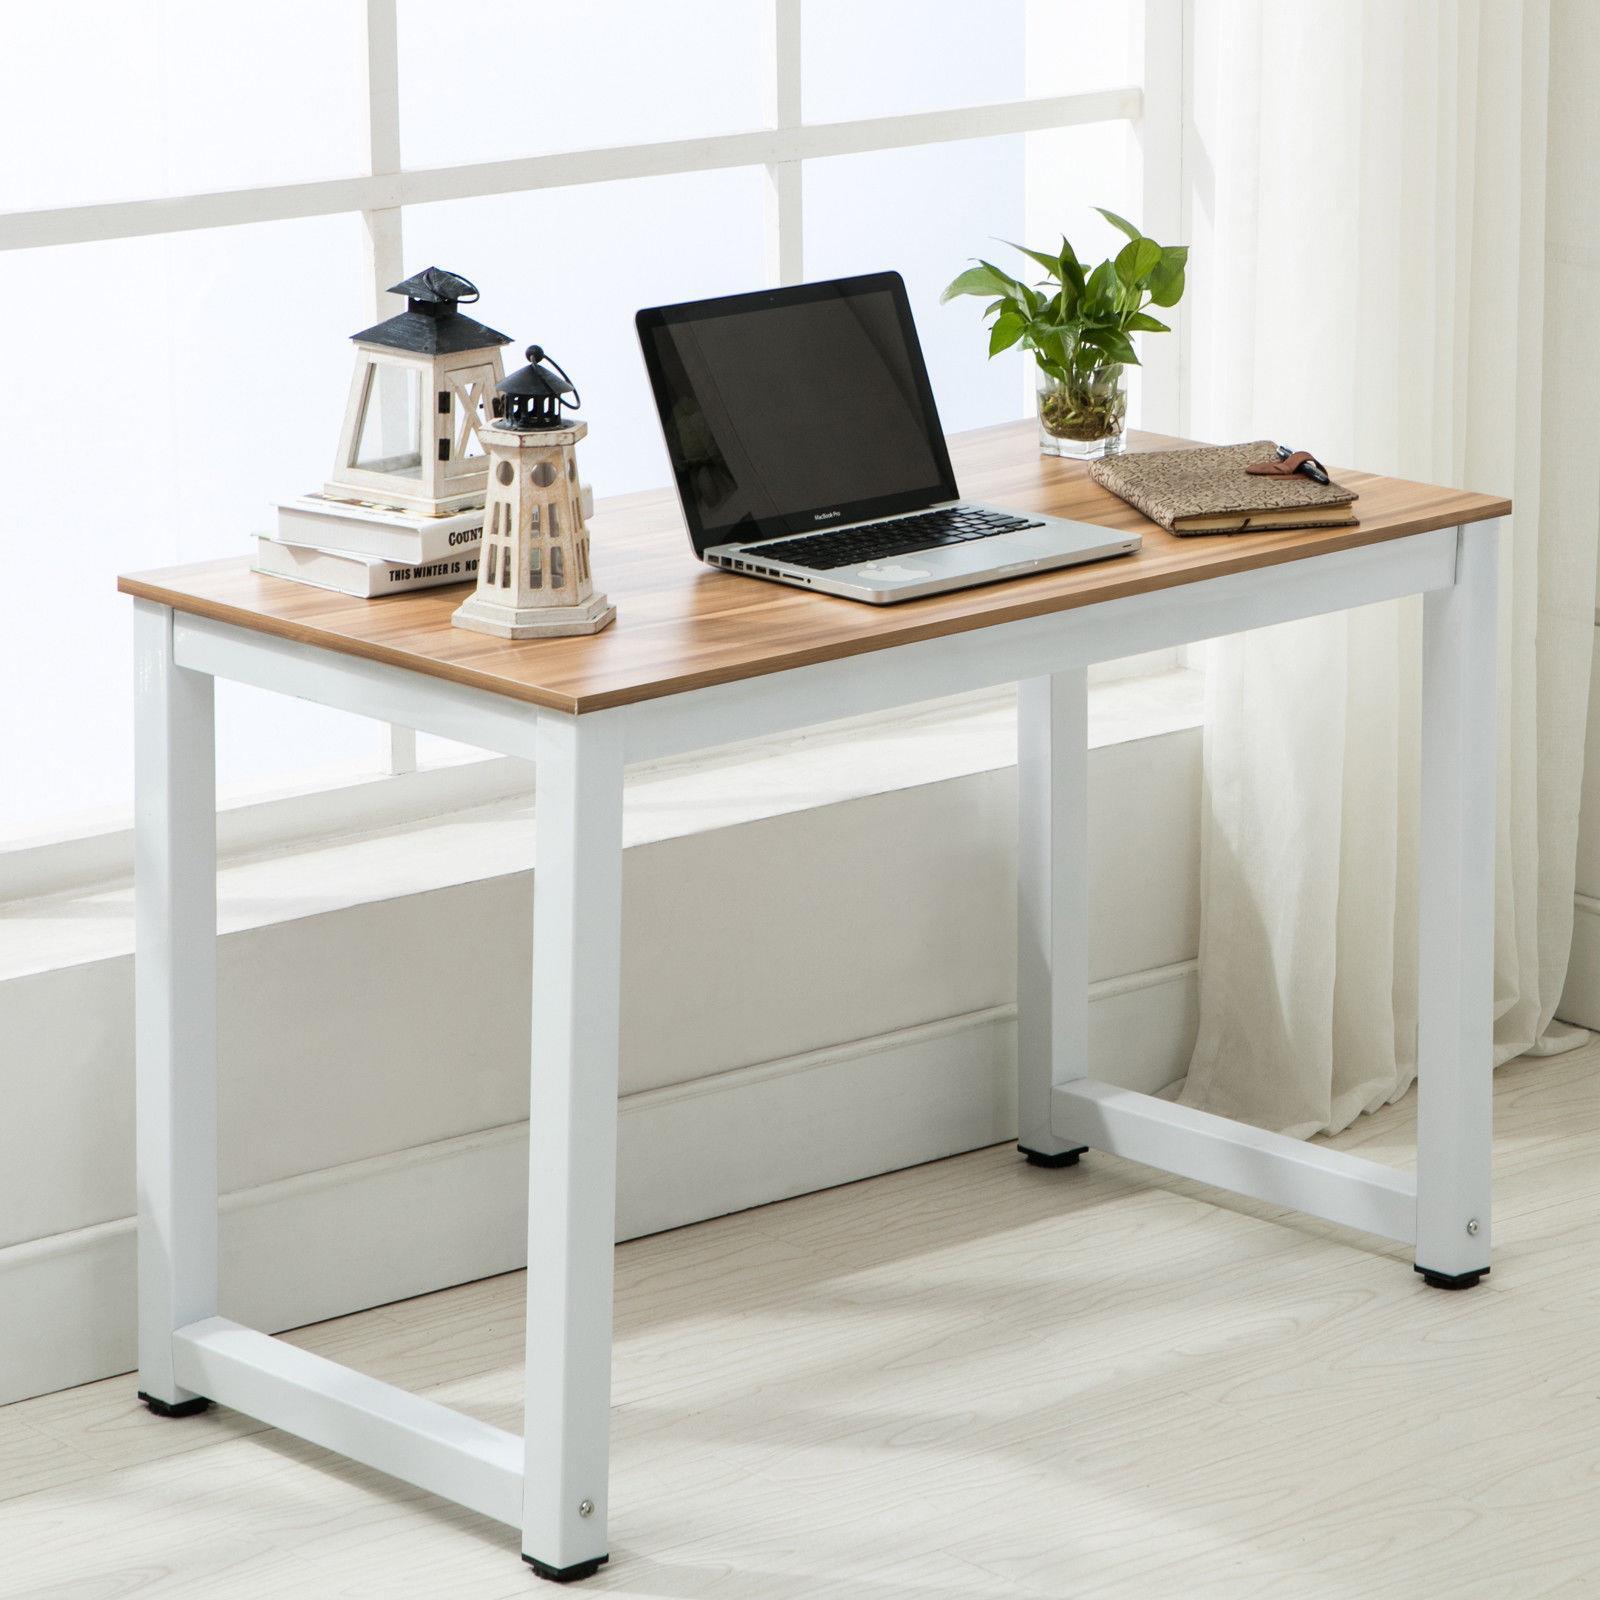 Home Garden Desks Home Office Furniture Wood Computer Desk Pc Laptop Study Table Workstation Home Office Furniture 43 Stbalia Ac Id